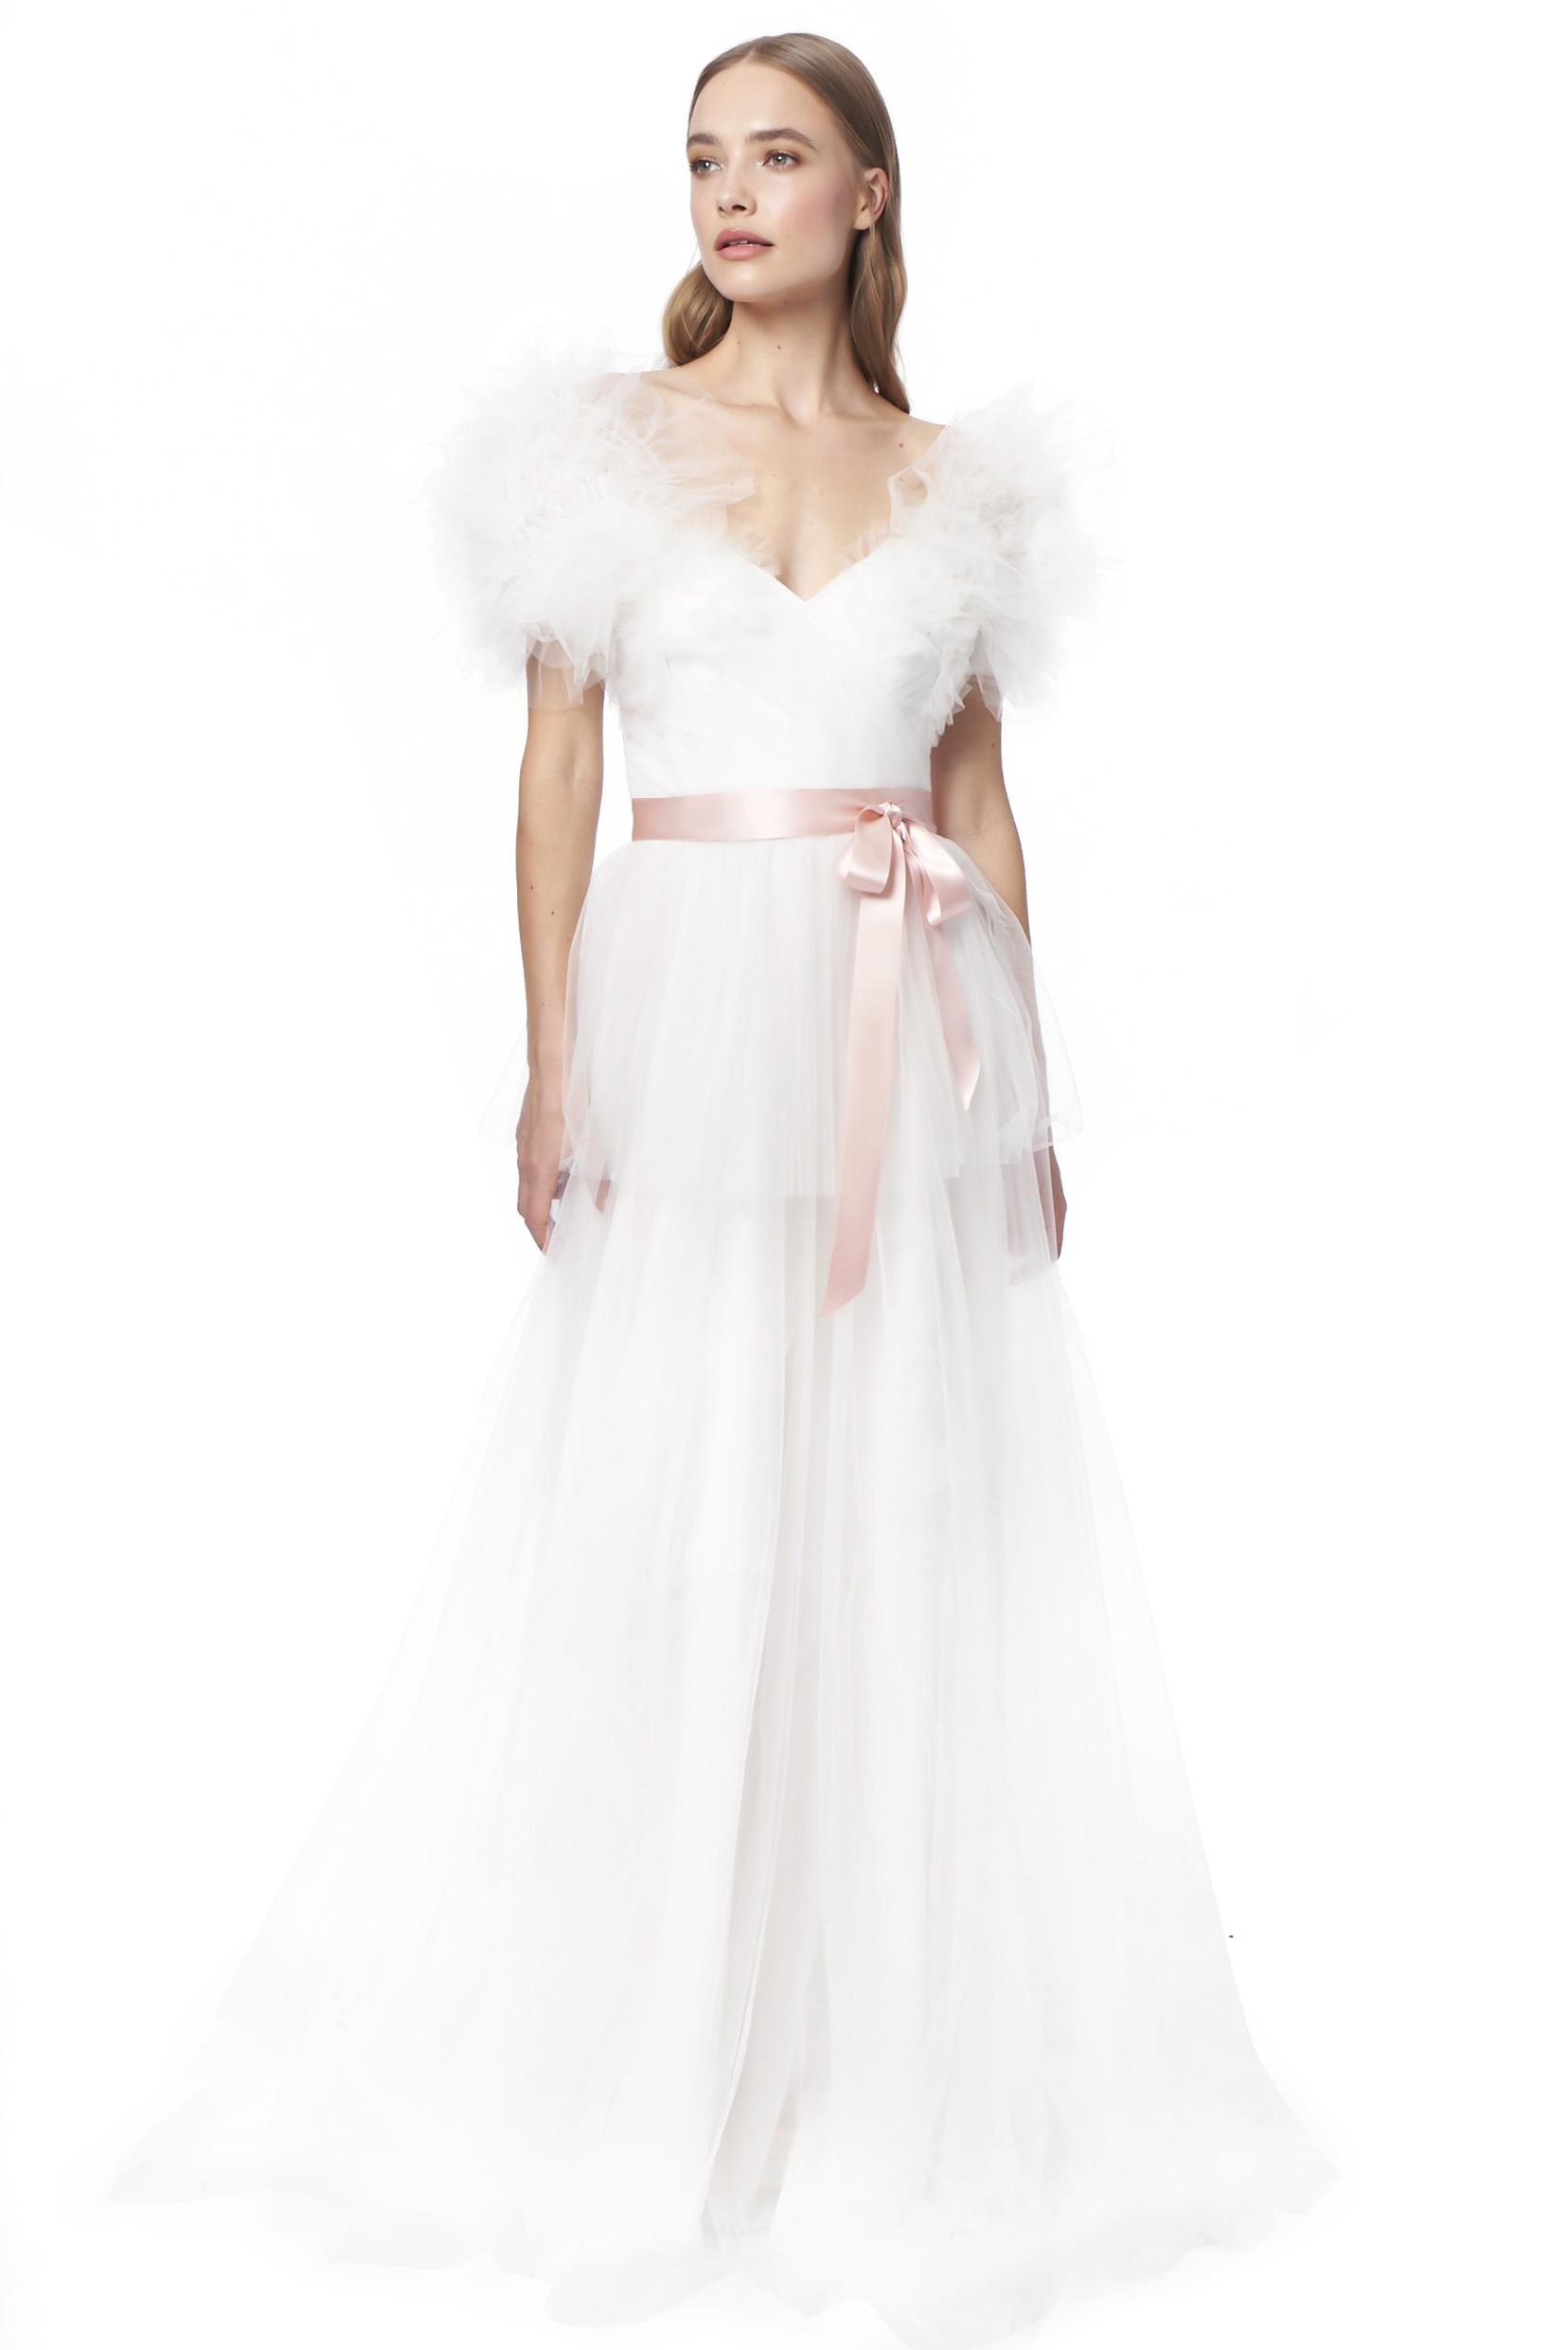 Jenny Packham Bridal Fall 2021